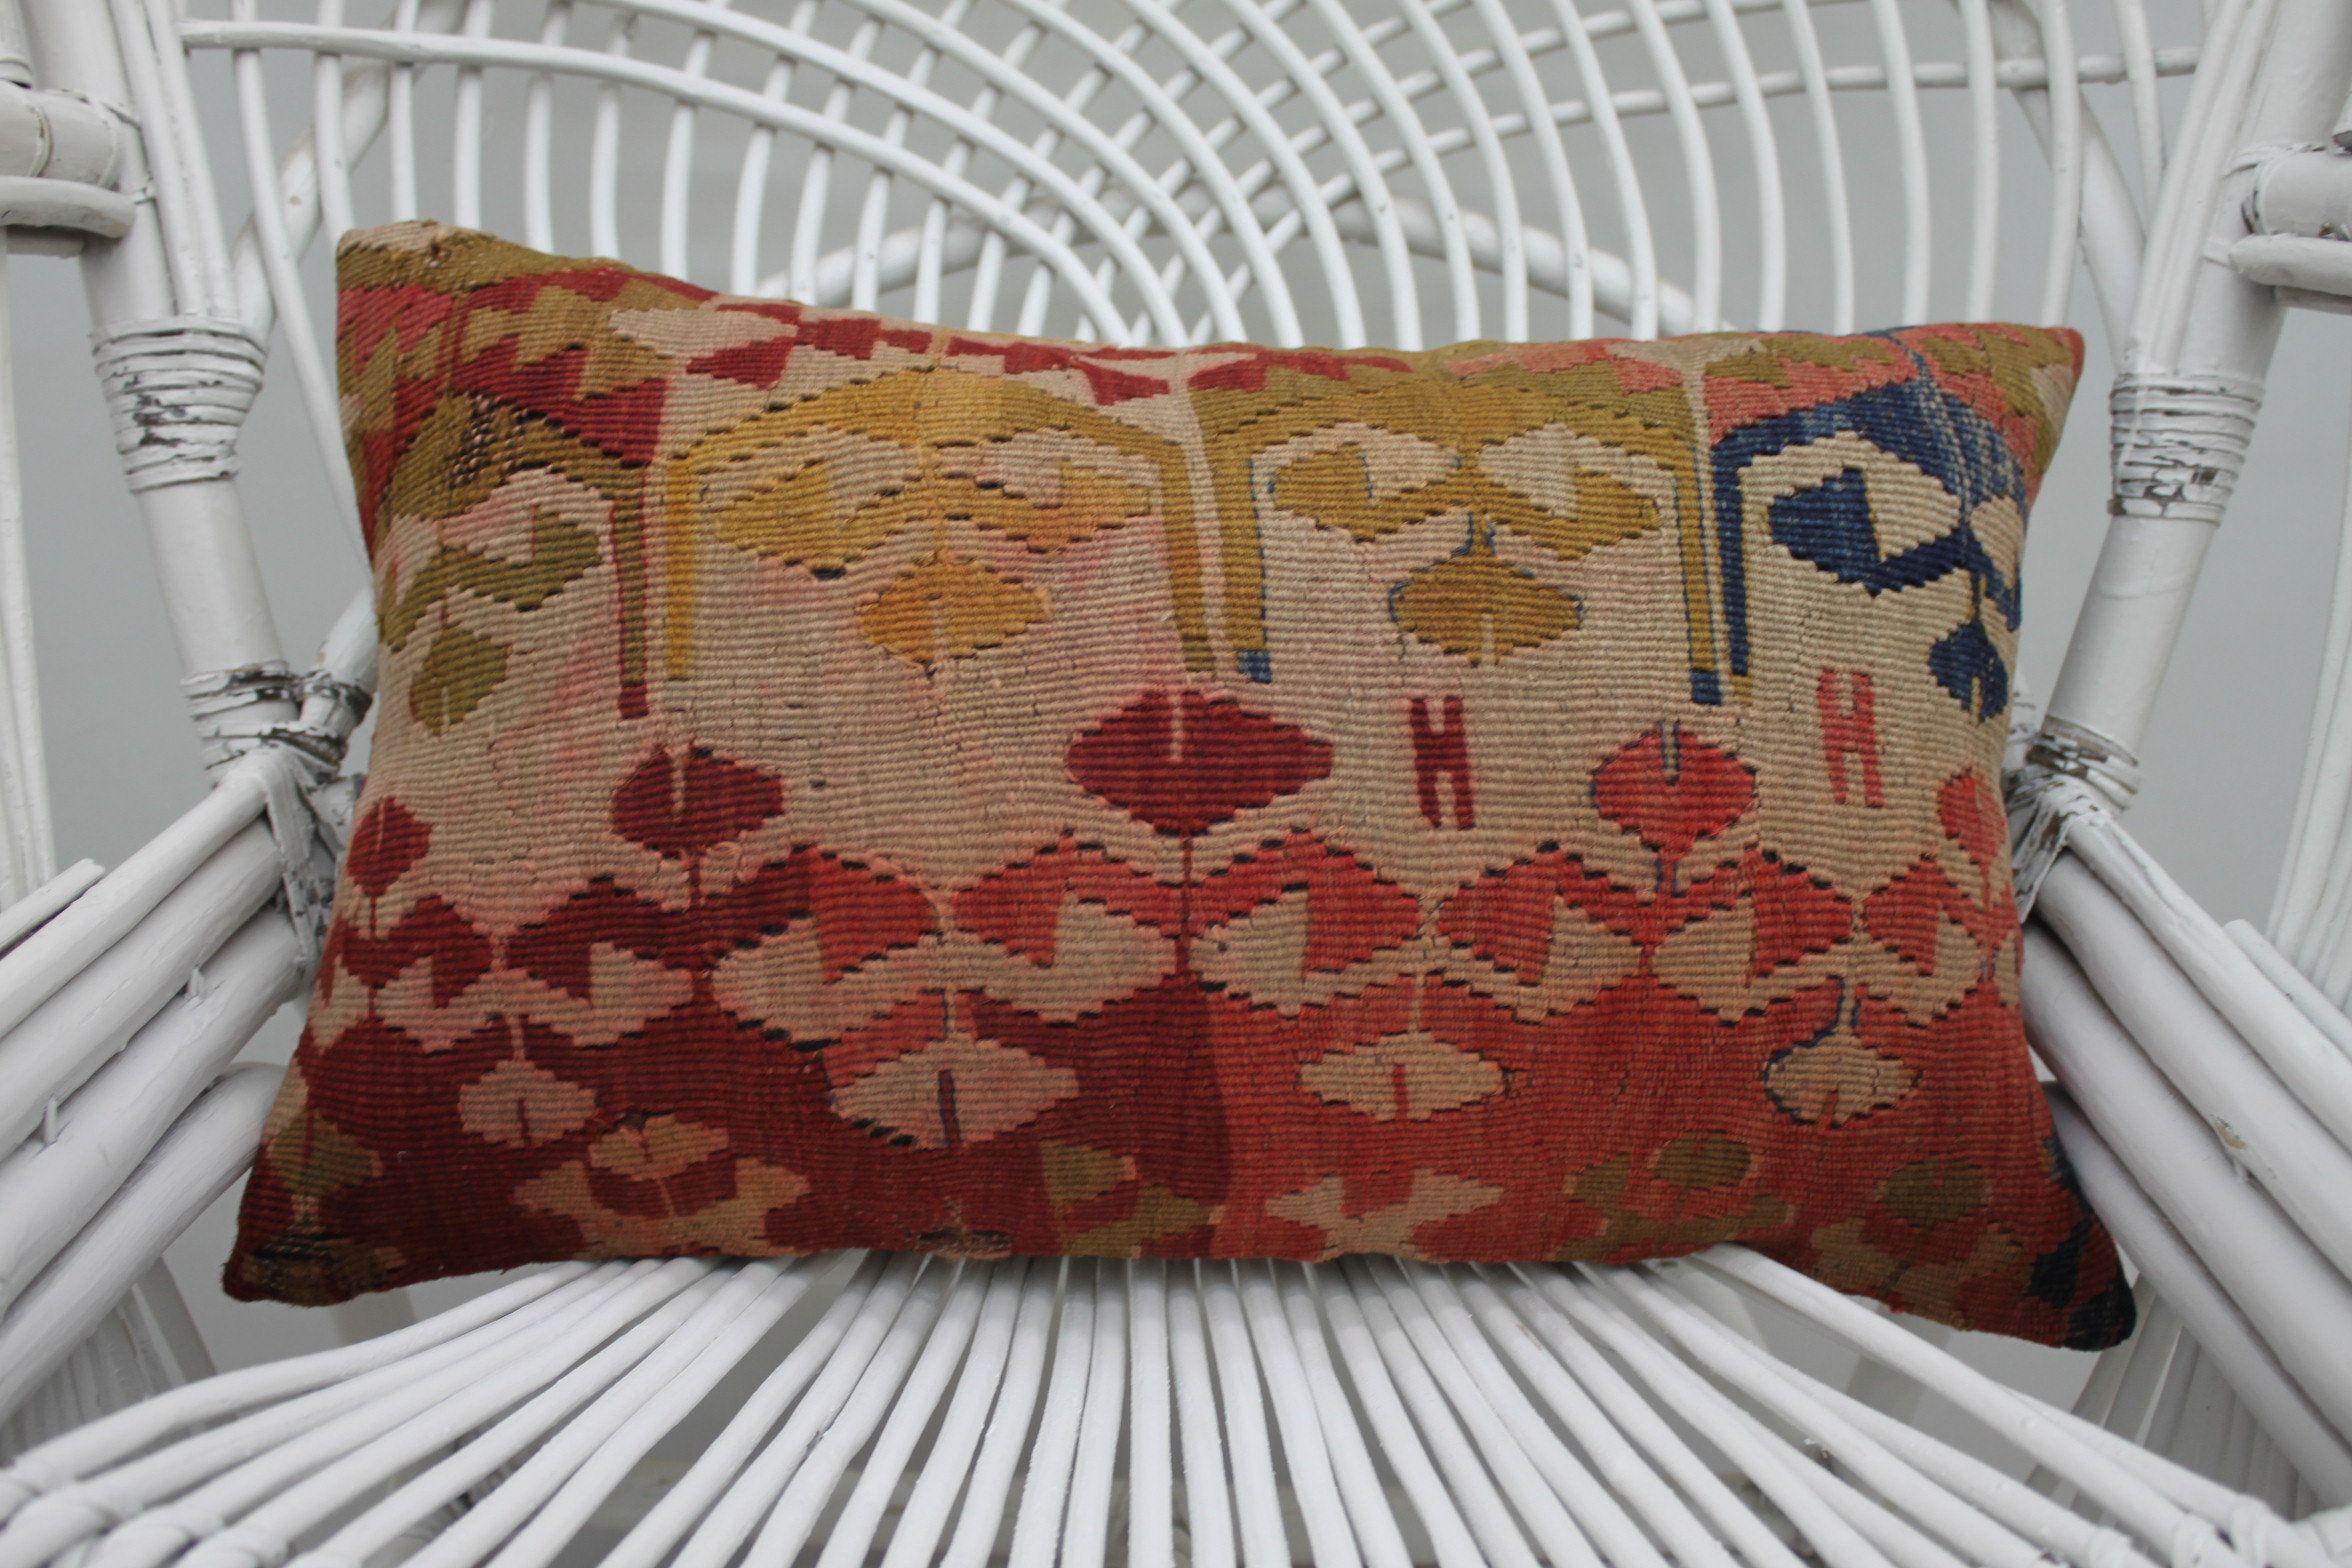 Kilim pillows boho pillows aztec pillows moroccan pillow 12x20 throw pillows turkish pillows cushion cover lumbar 30x50 cm kilim pillow 2501